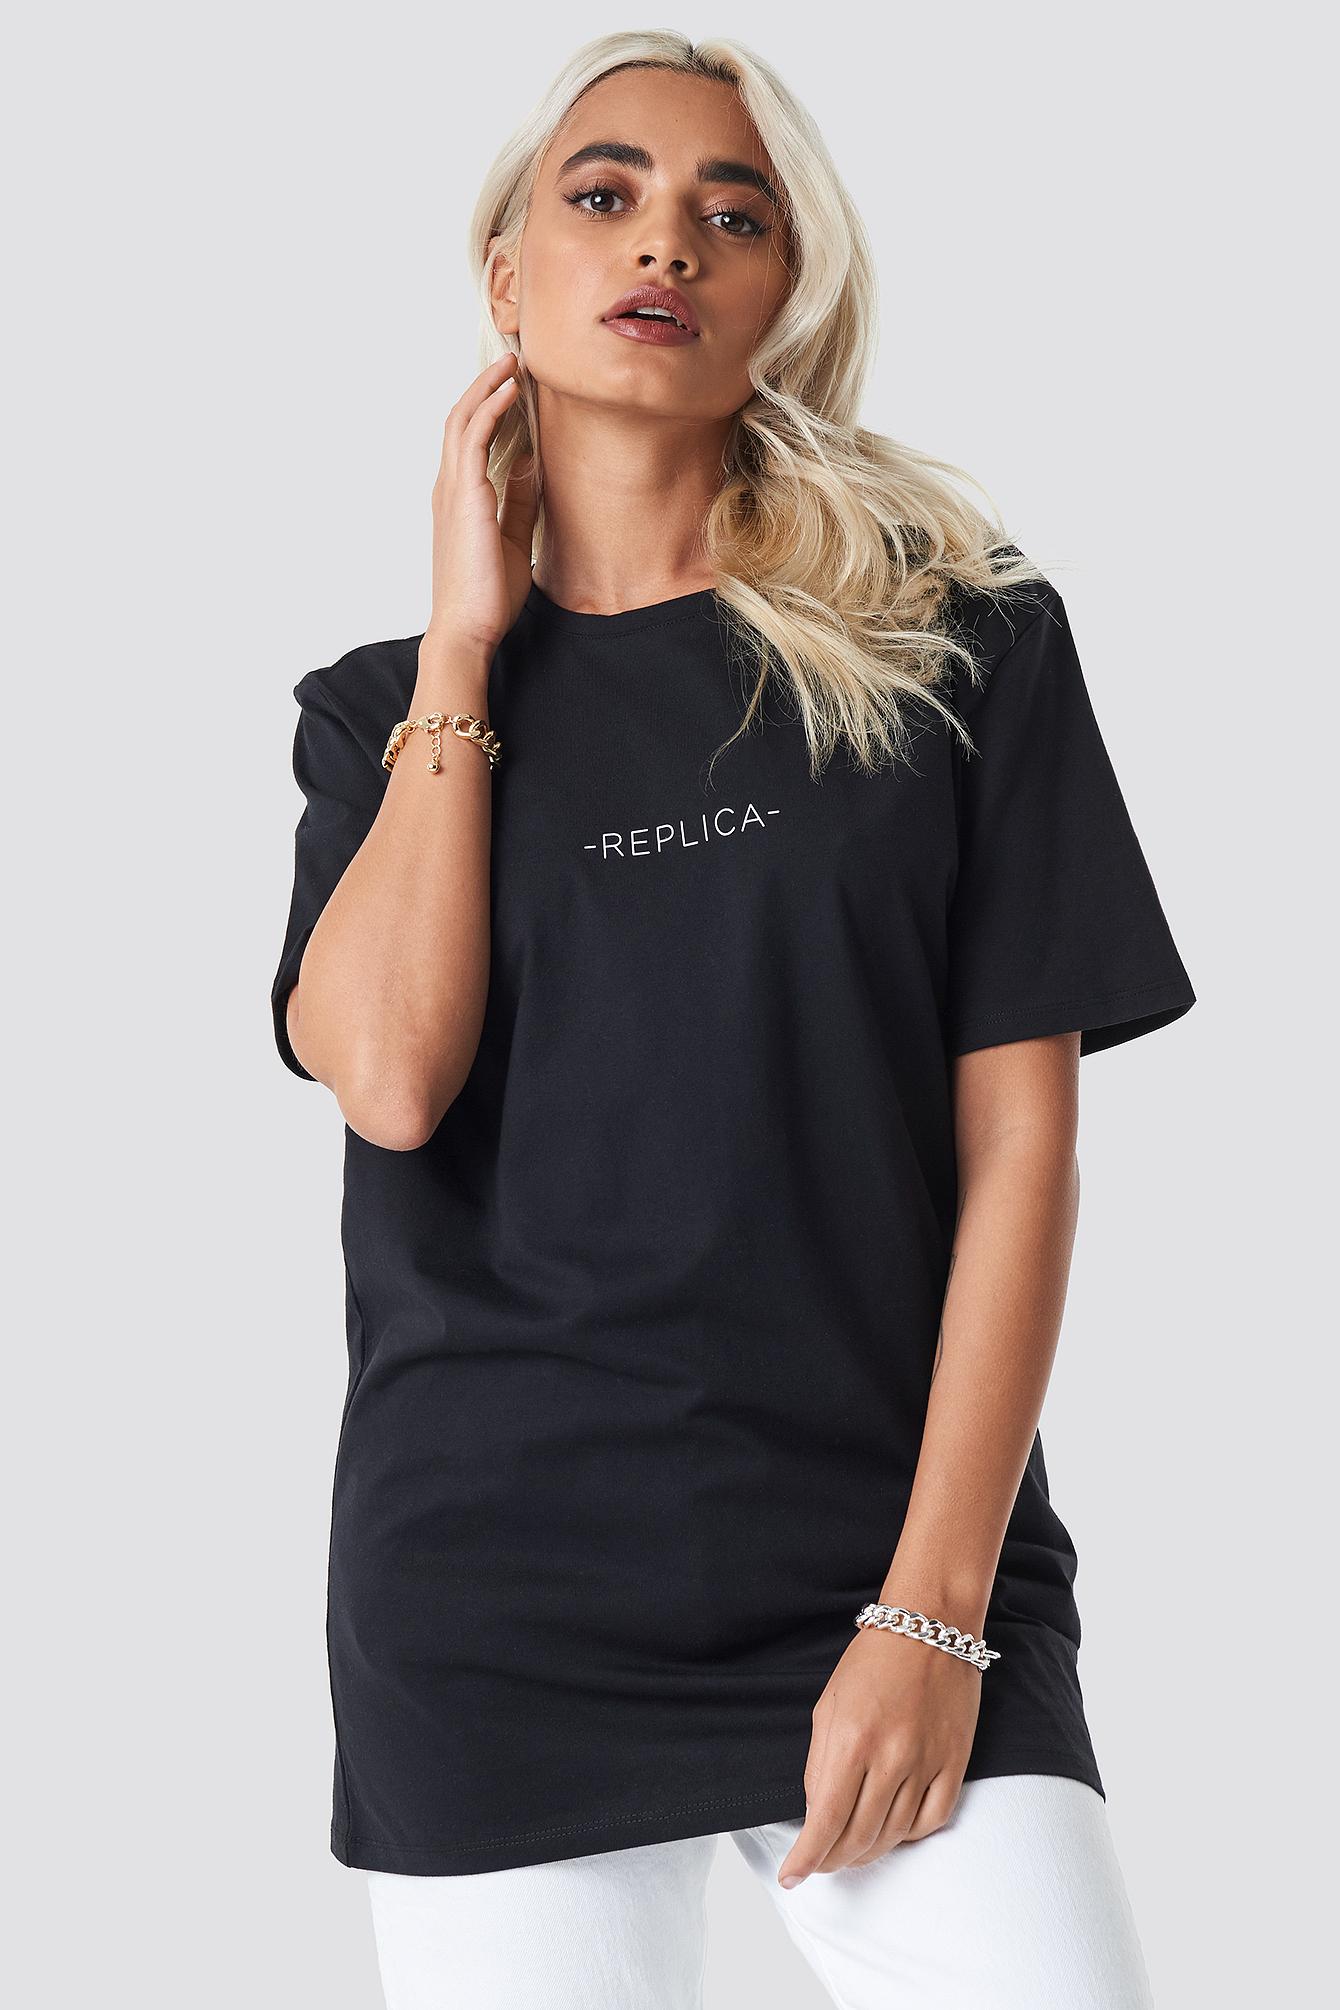 Replica Oversized Tee NA-KD.COM